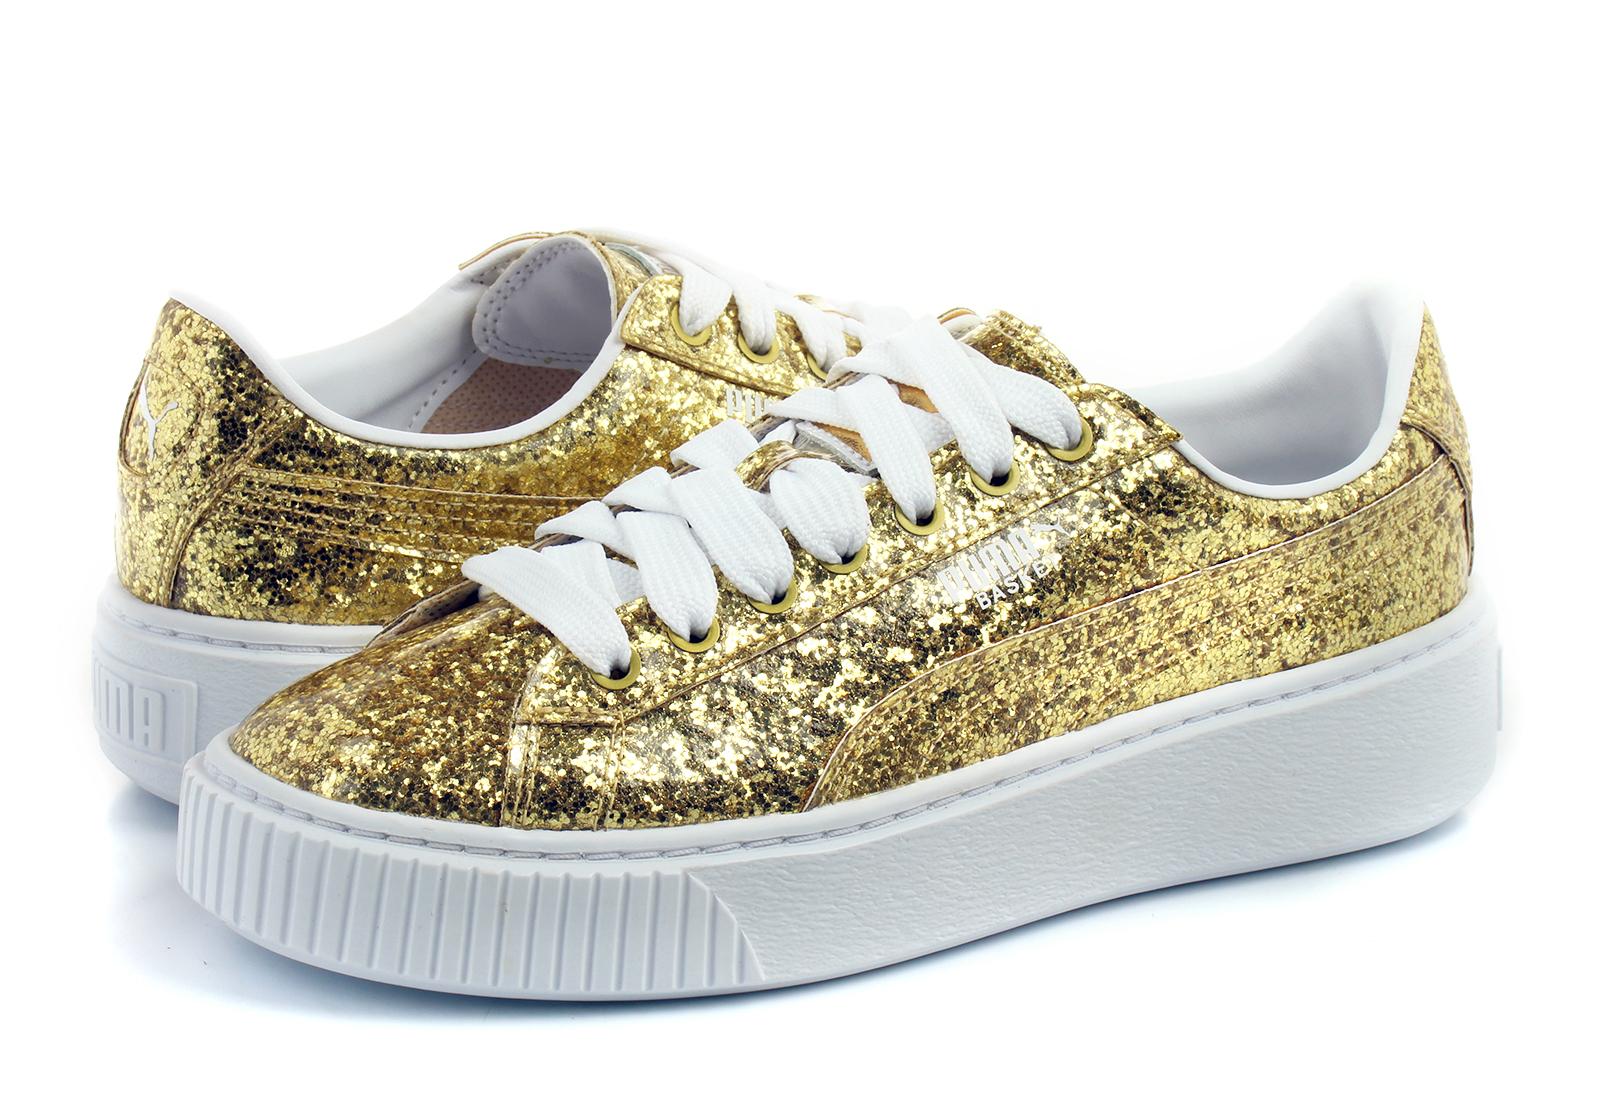 Puma Shoes - Basket Platform Glitter Wns - 36409302-gld - Online ... aebc17726f1